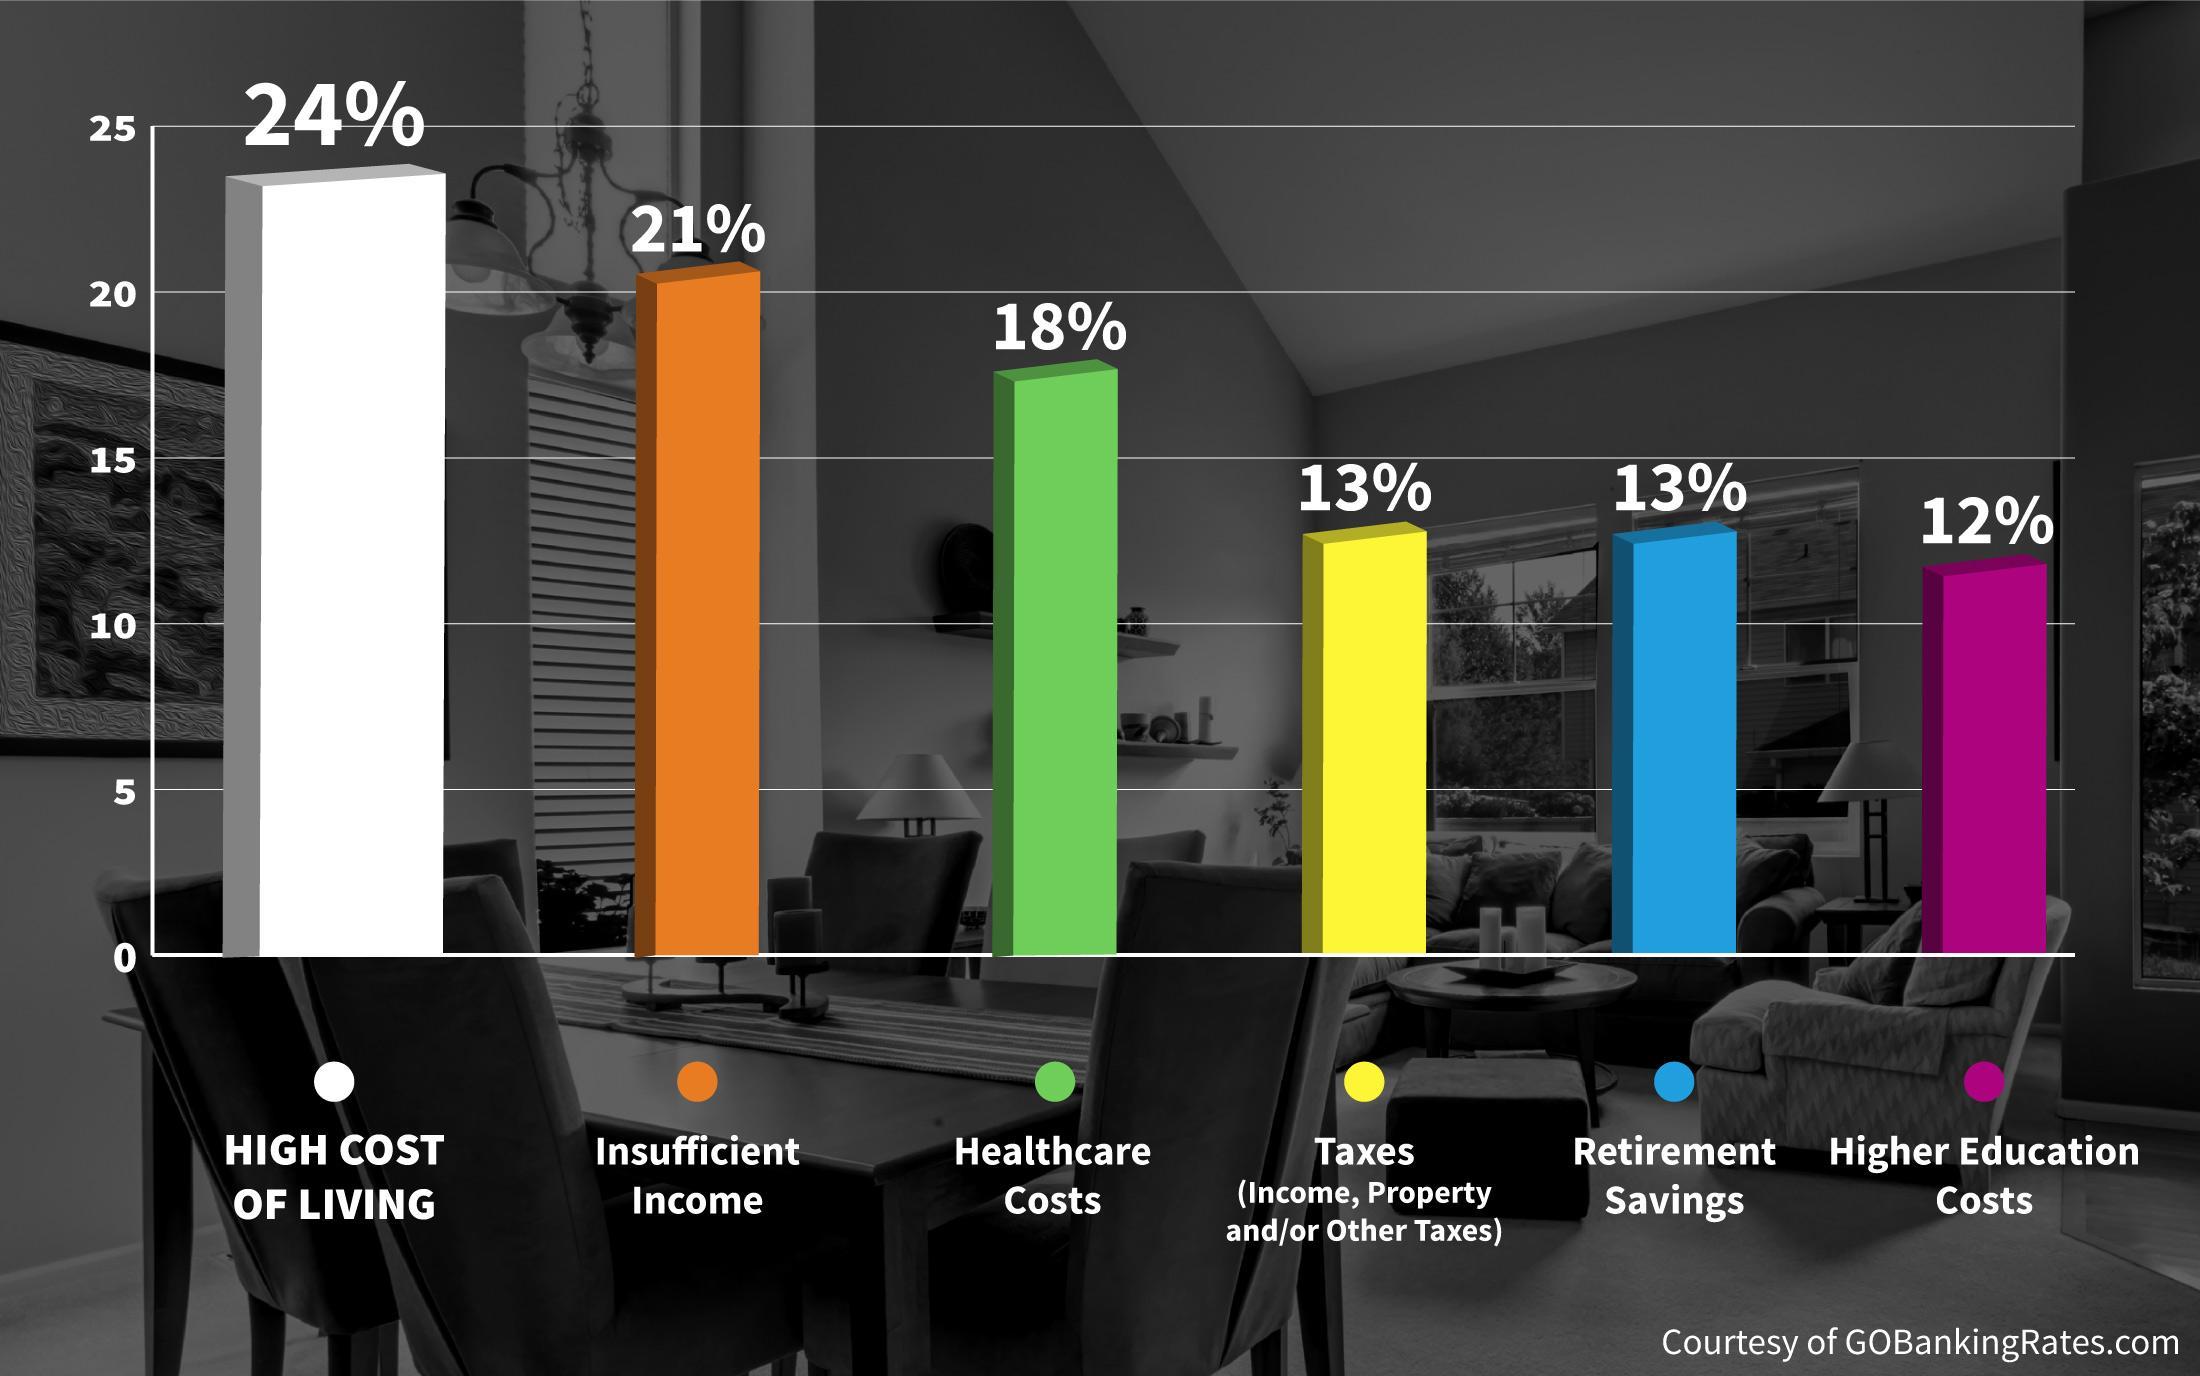 Americans' Biggest Financial Burdens Survey Results